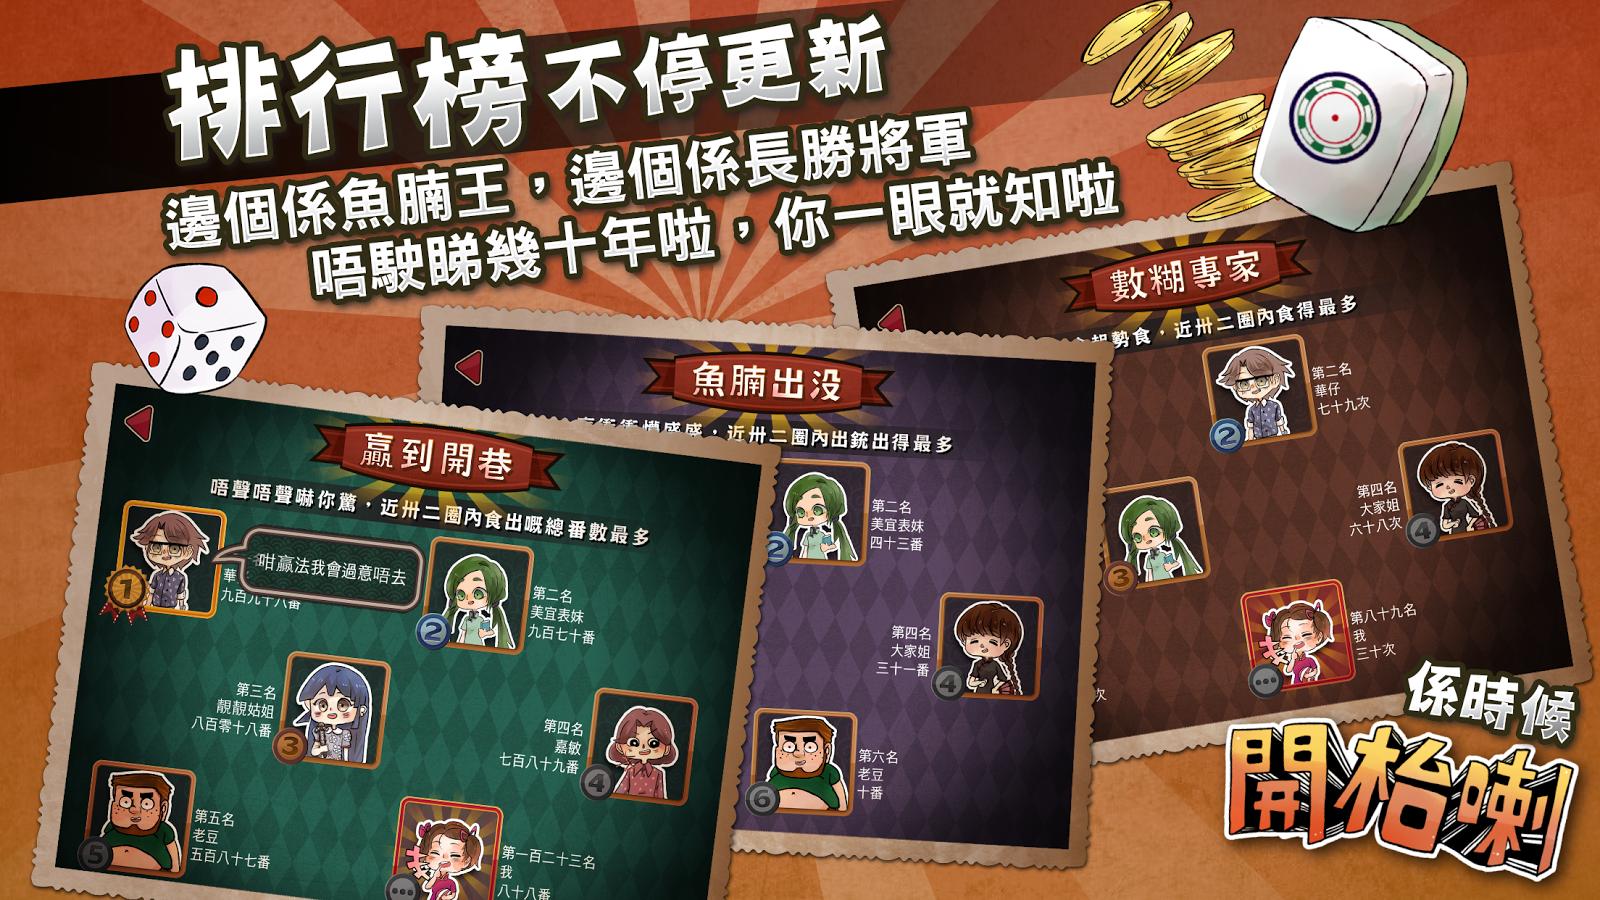 開枱喇 港式麻雀任你玩 - Let's Mahjong - Google Play Android 應用程式